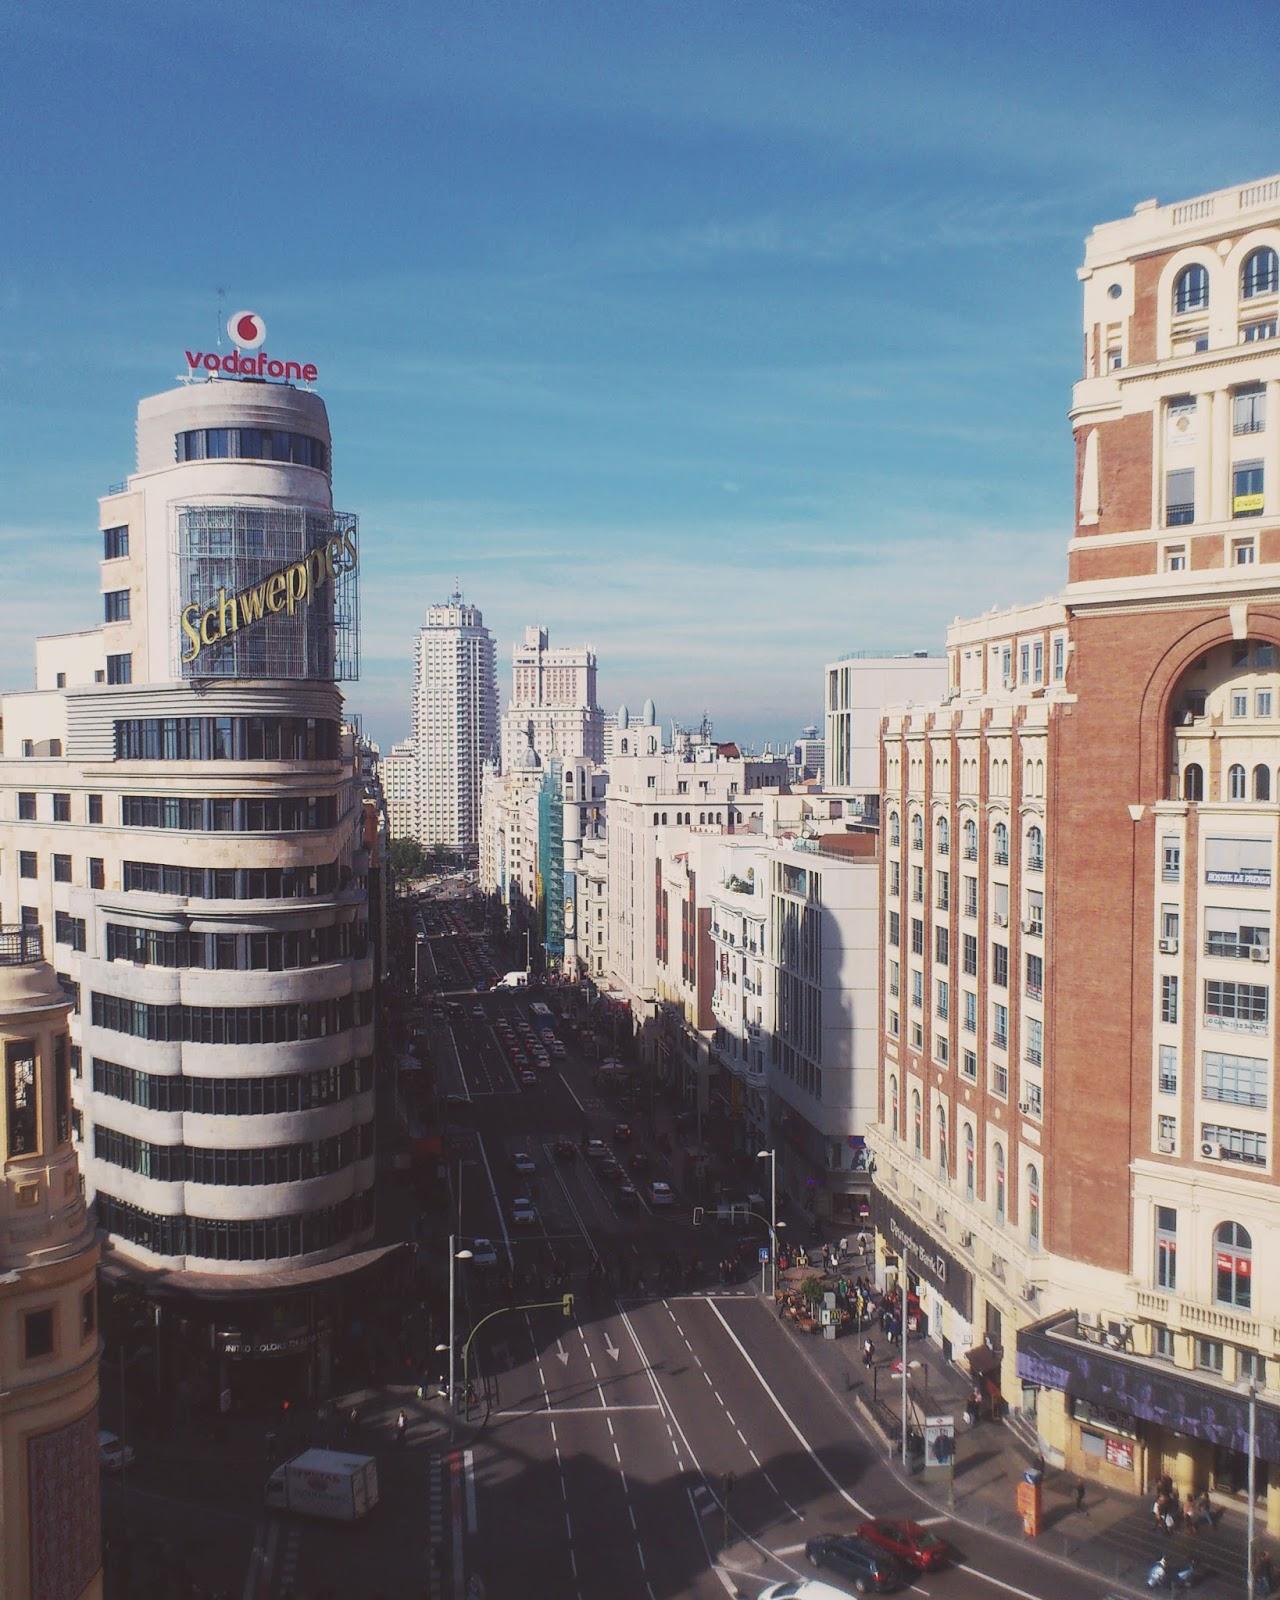 Madrid panorama viewing platform gran via street el corte ingles